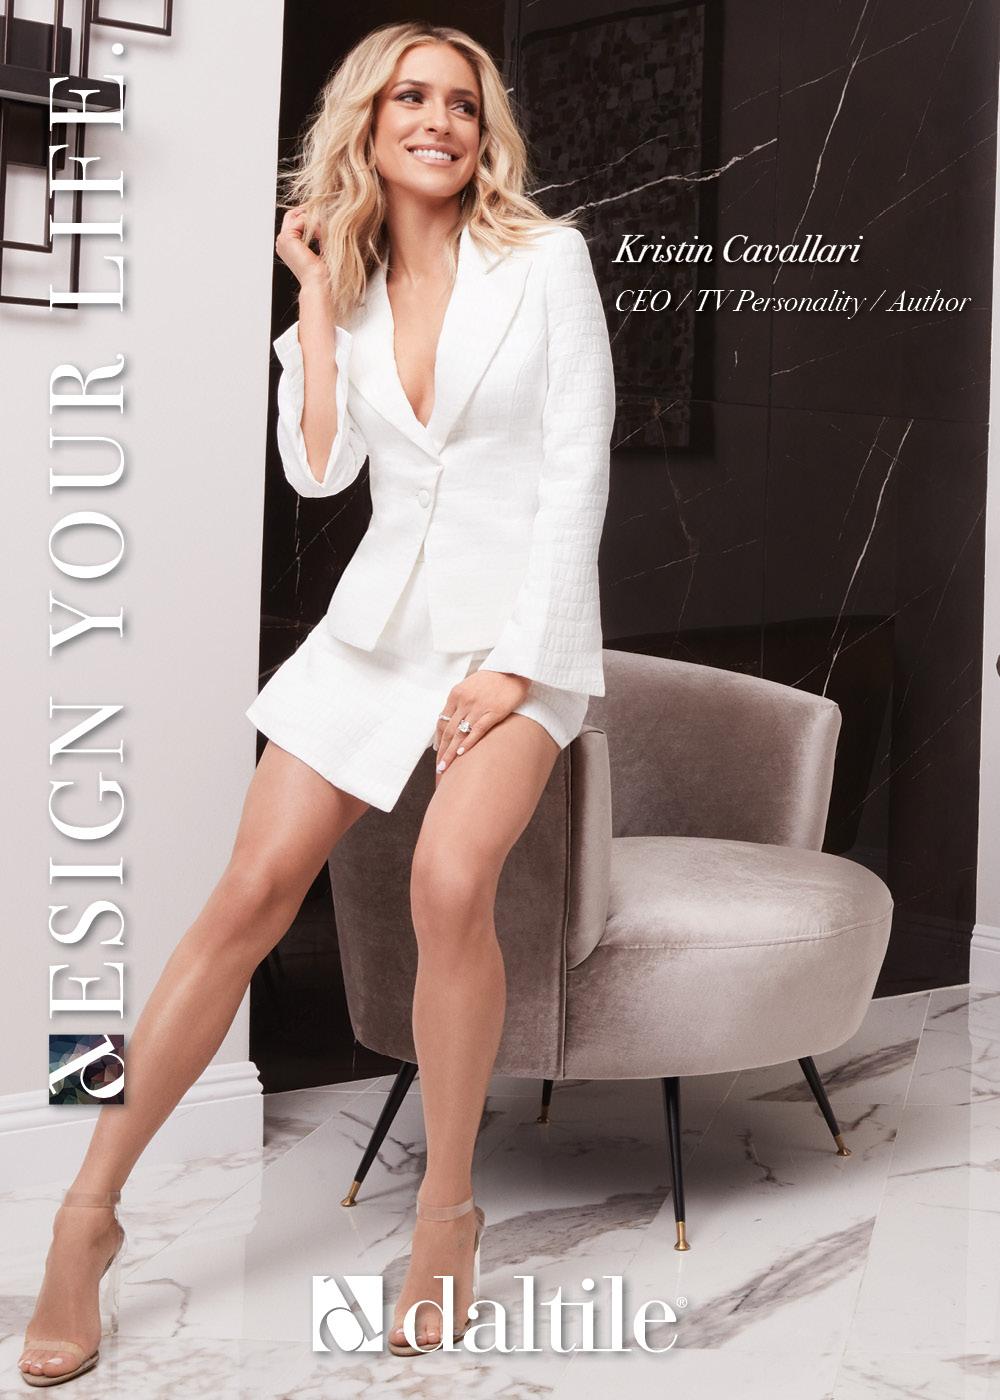 Daltile Announces Kristin Cavallari As New Brand